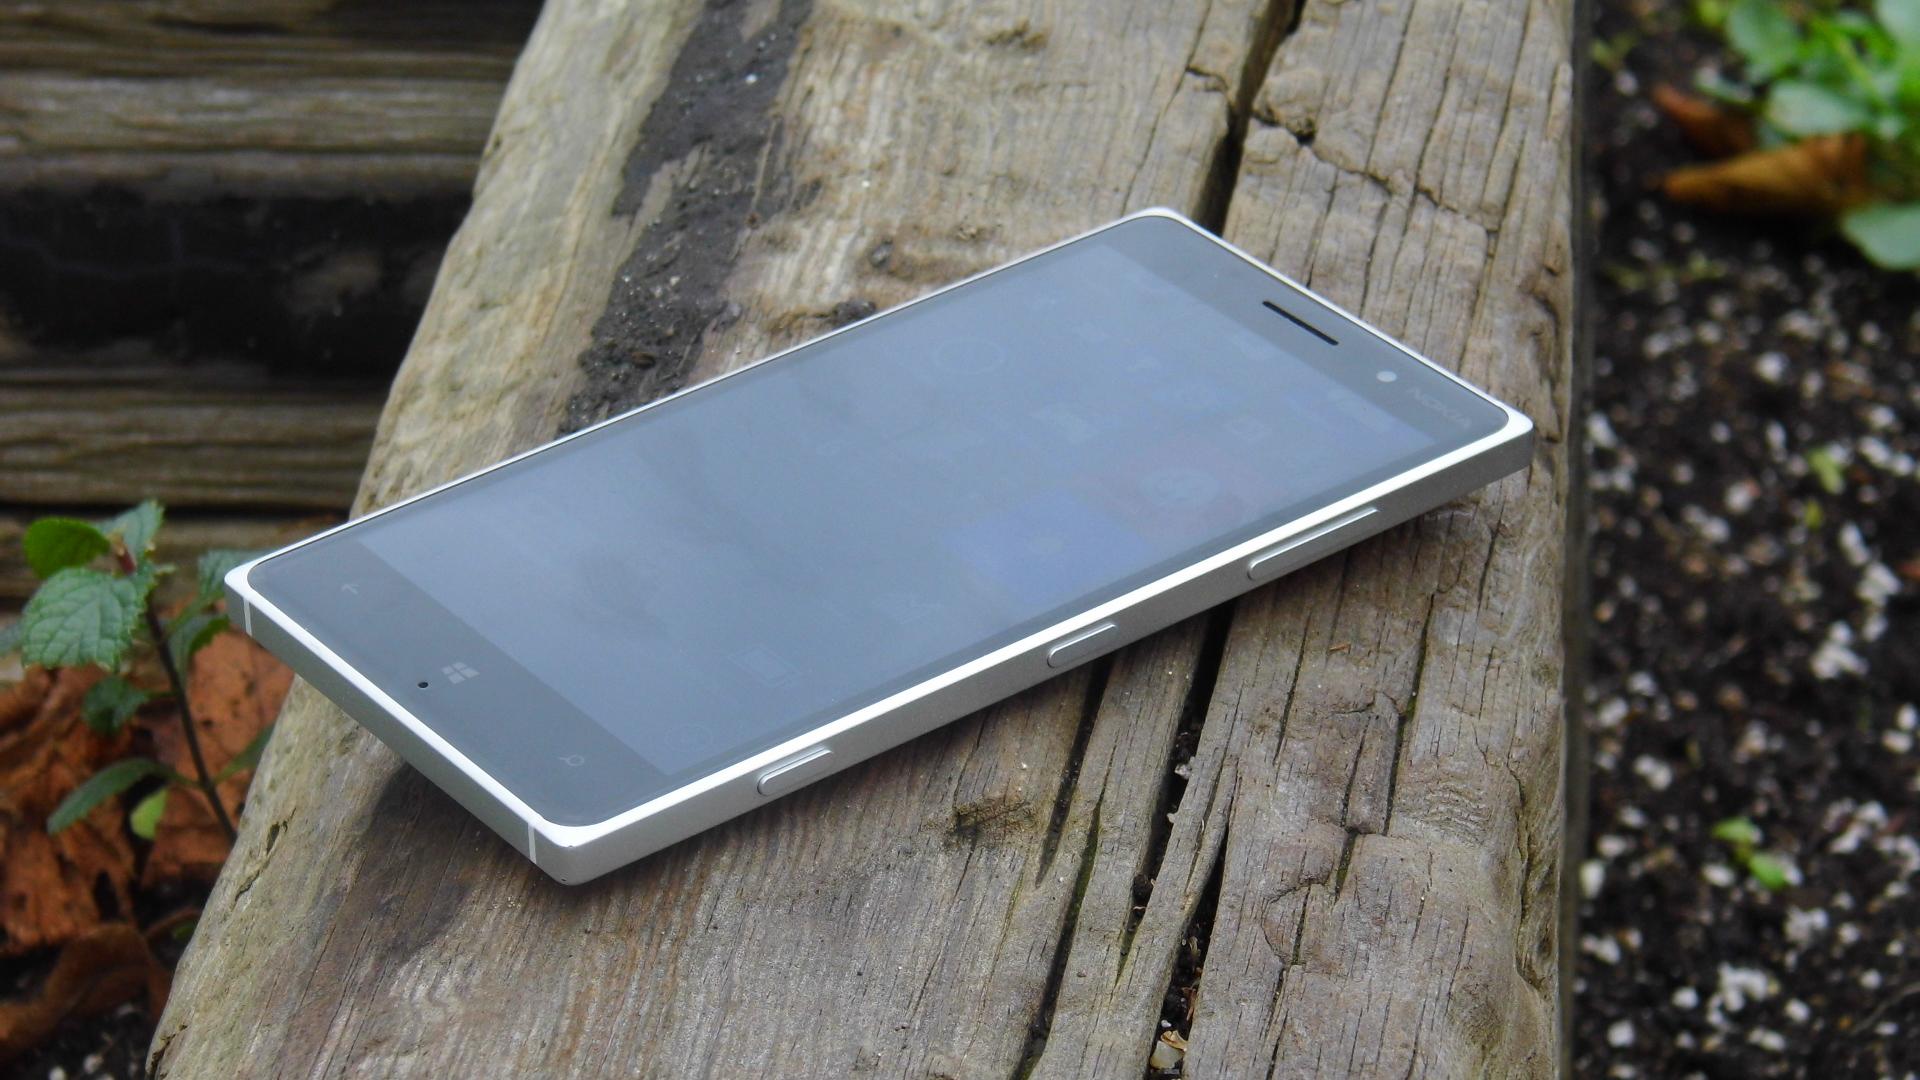 Nokia lumia 830 reviews - Nokia Lumia 830 Reviews 32